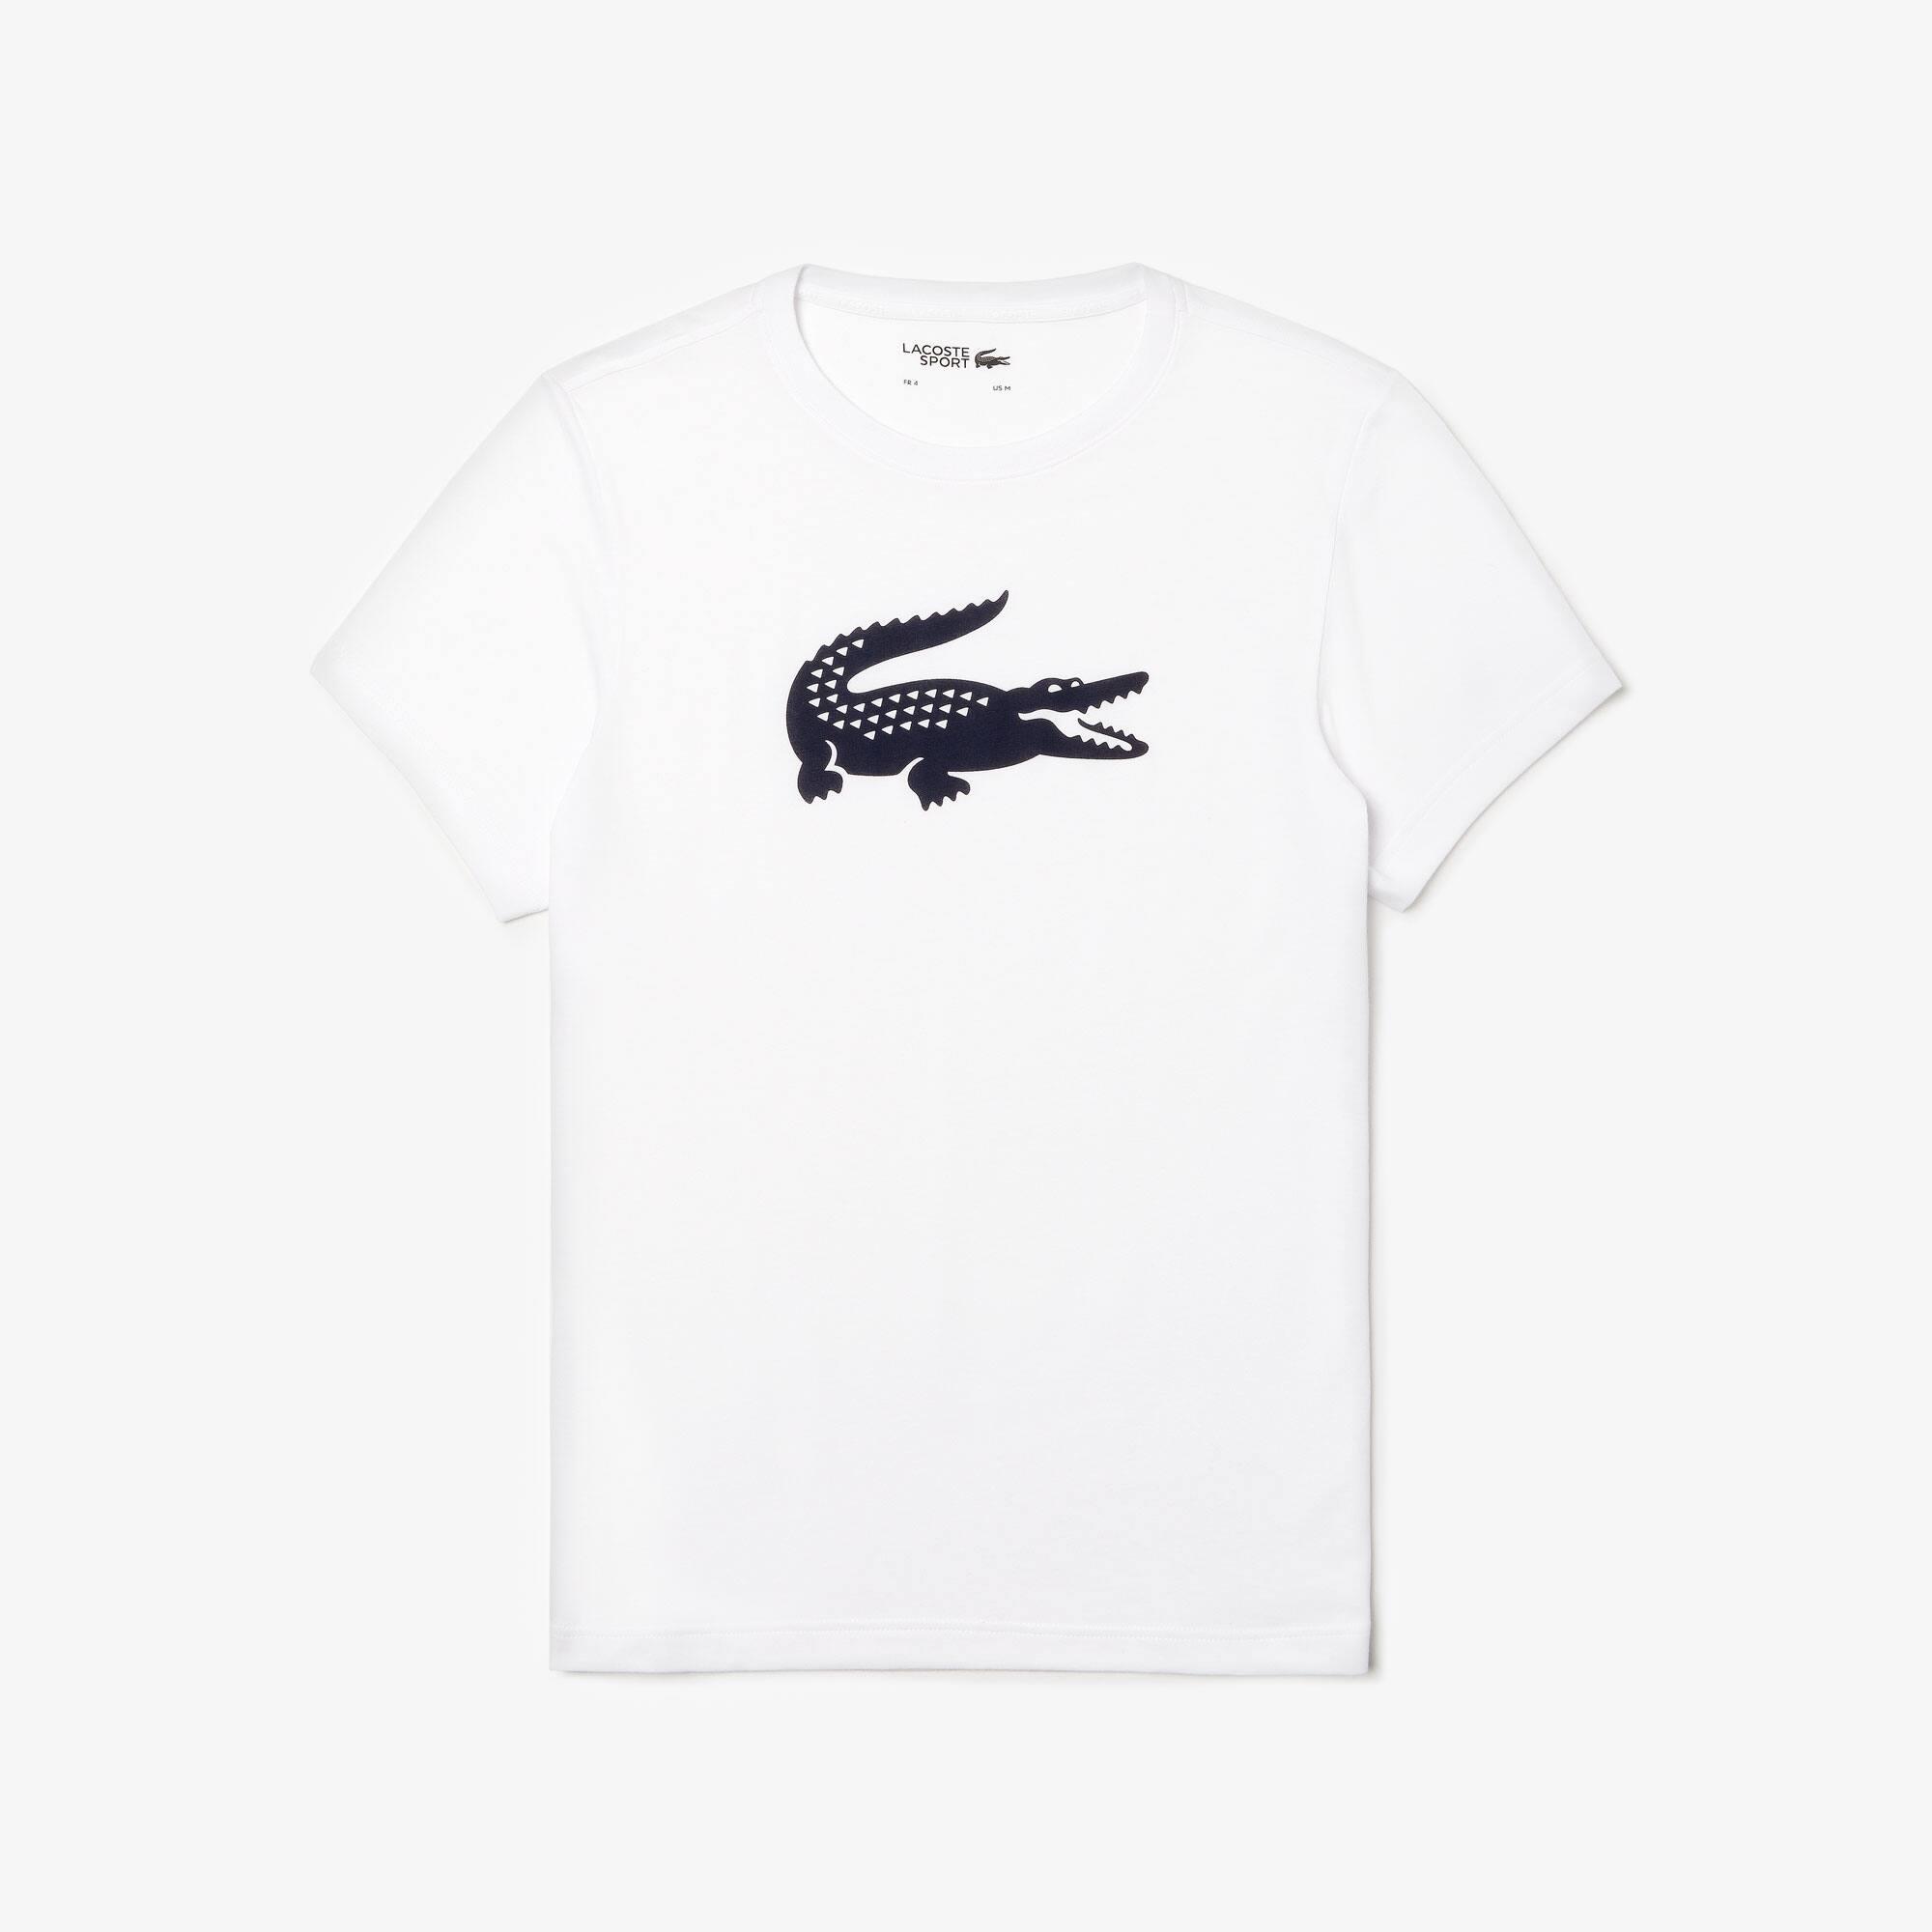 Lacoste - Camiseta Tenis Lacoste SPORT De Punto Técnico Con Cocodrilo Oversized - 3